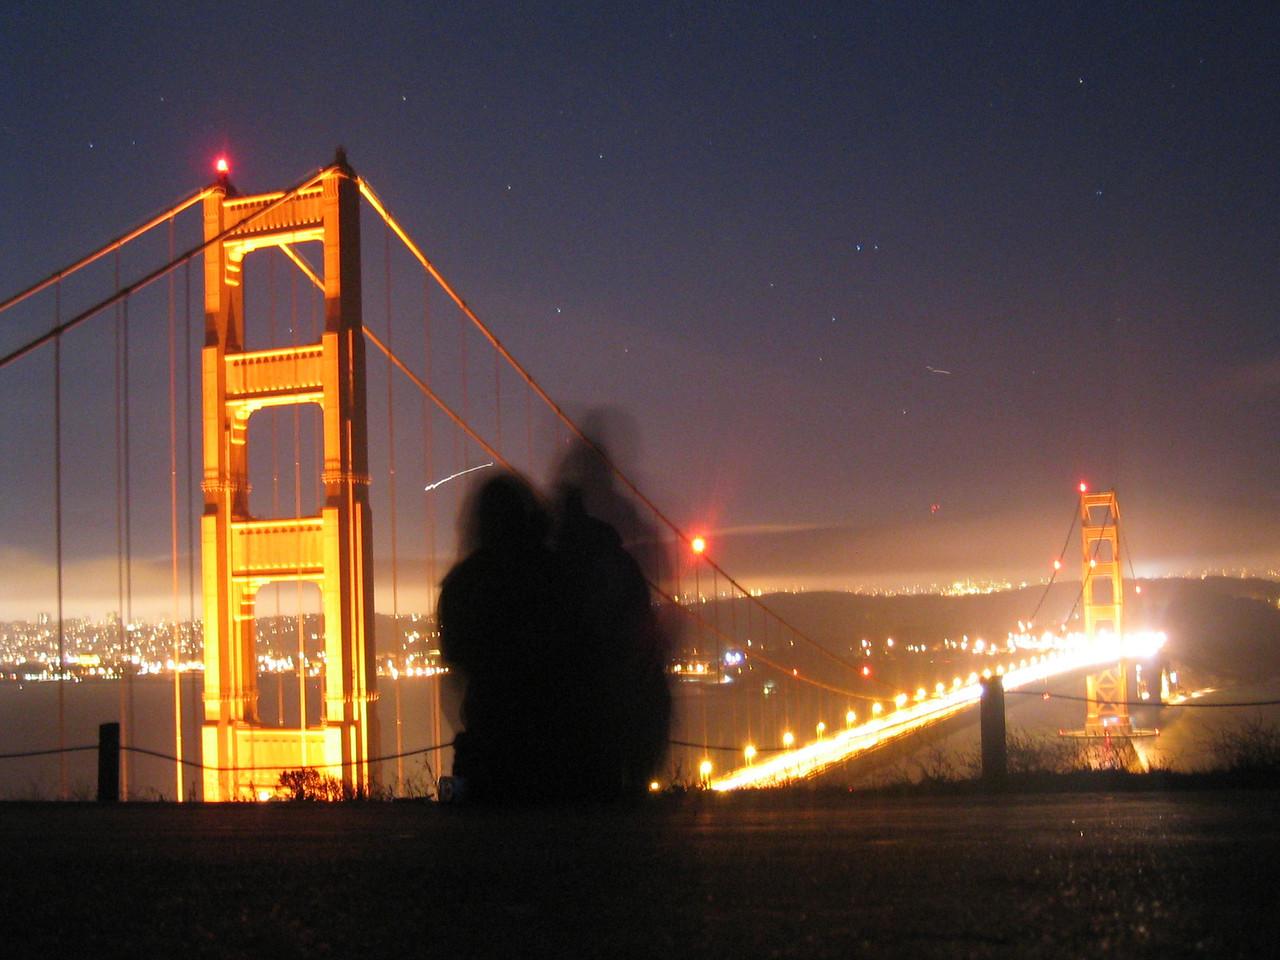 2004 07 12 Monday - Carrie & Melody @ Golden Gate Bridge